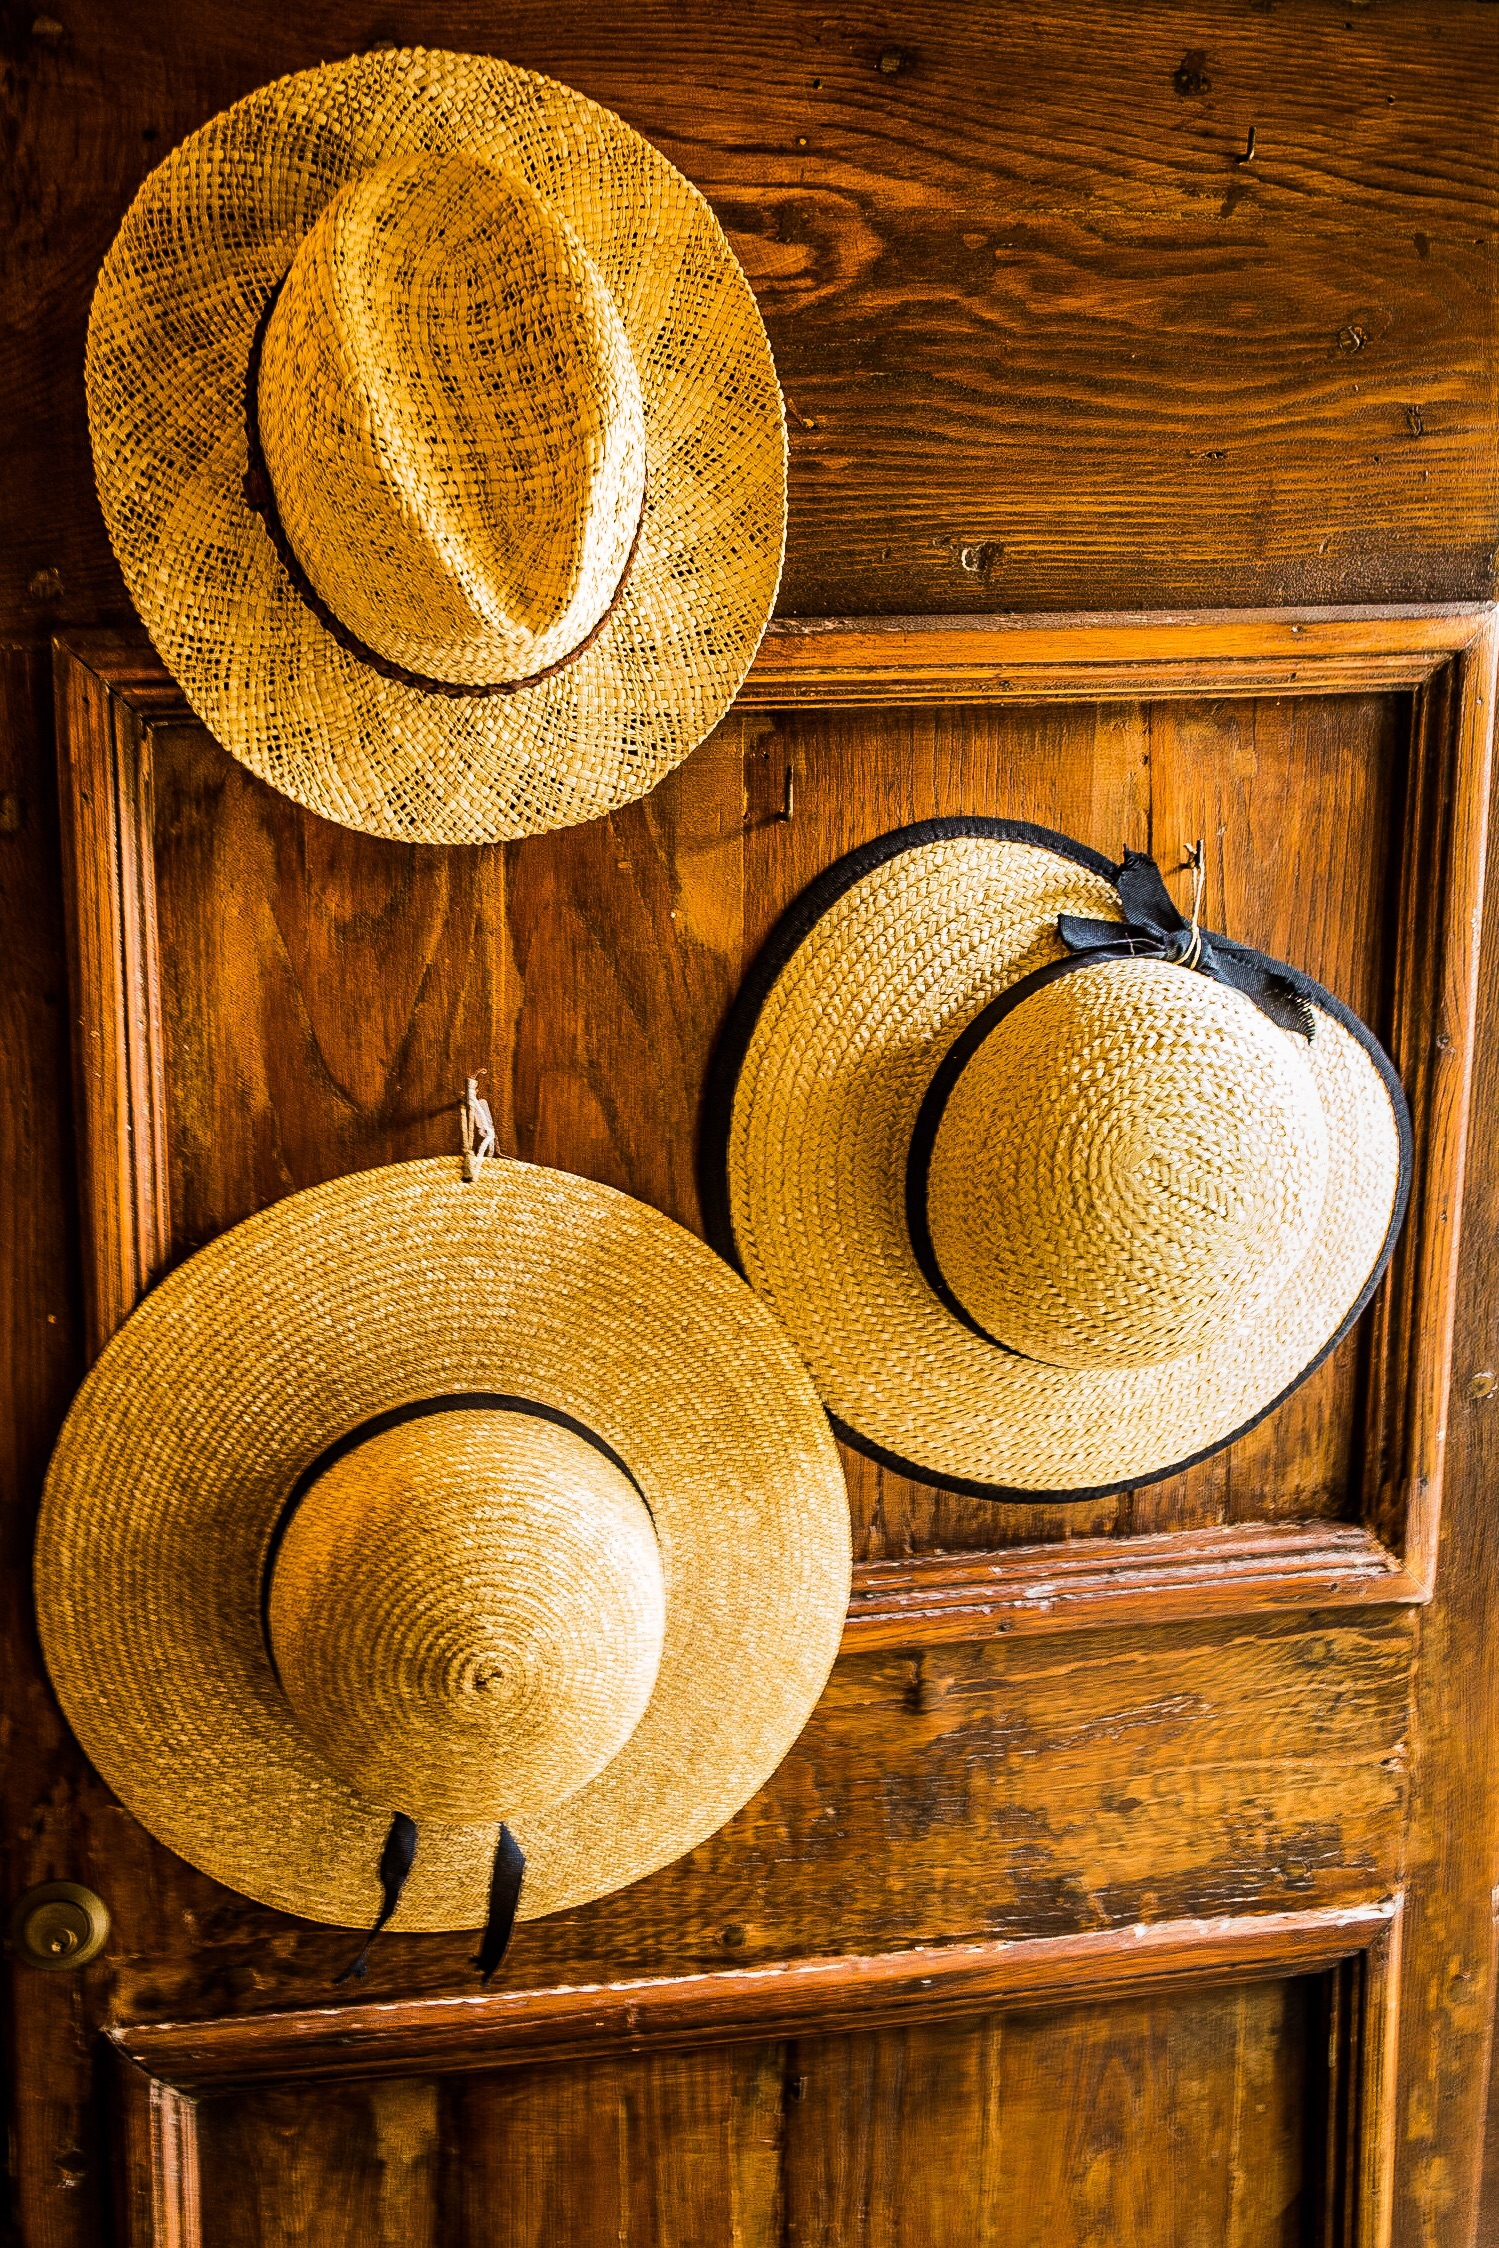 Hats on a door, Italy by Rick McEvoy travel photographer